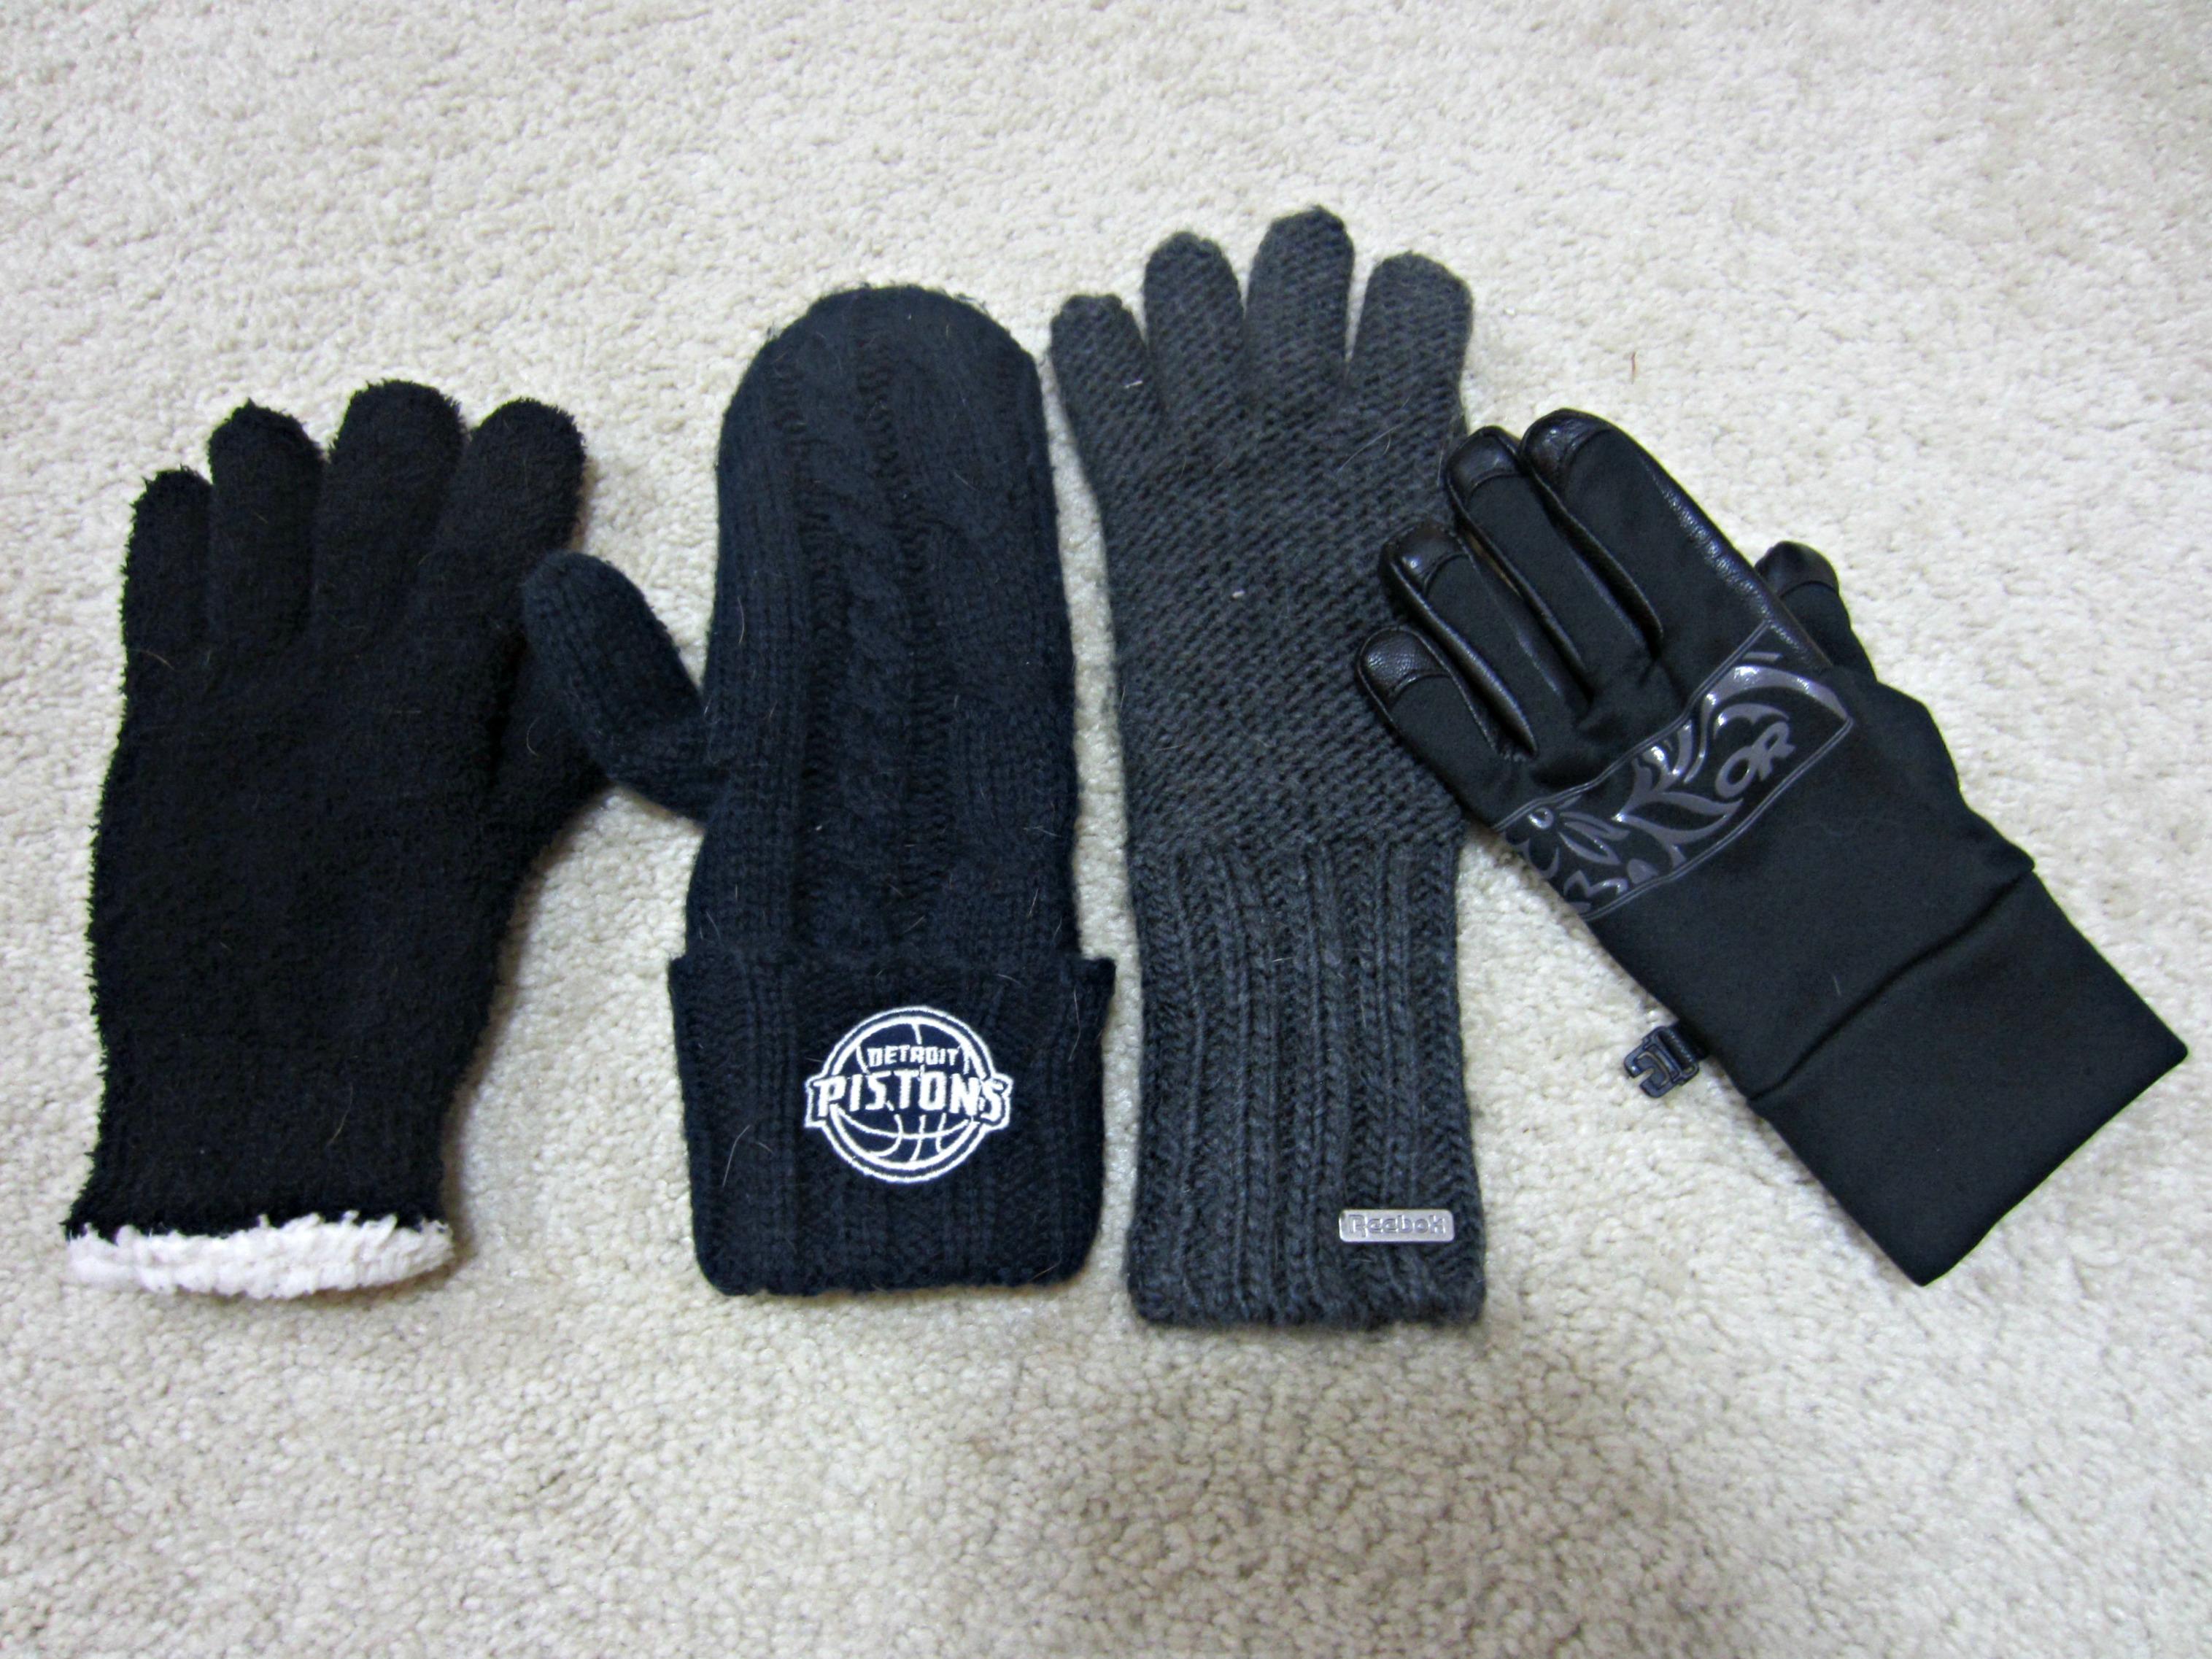 single gloves